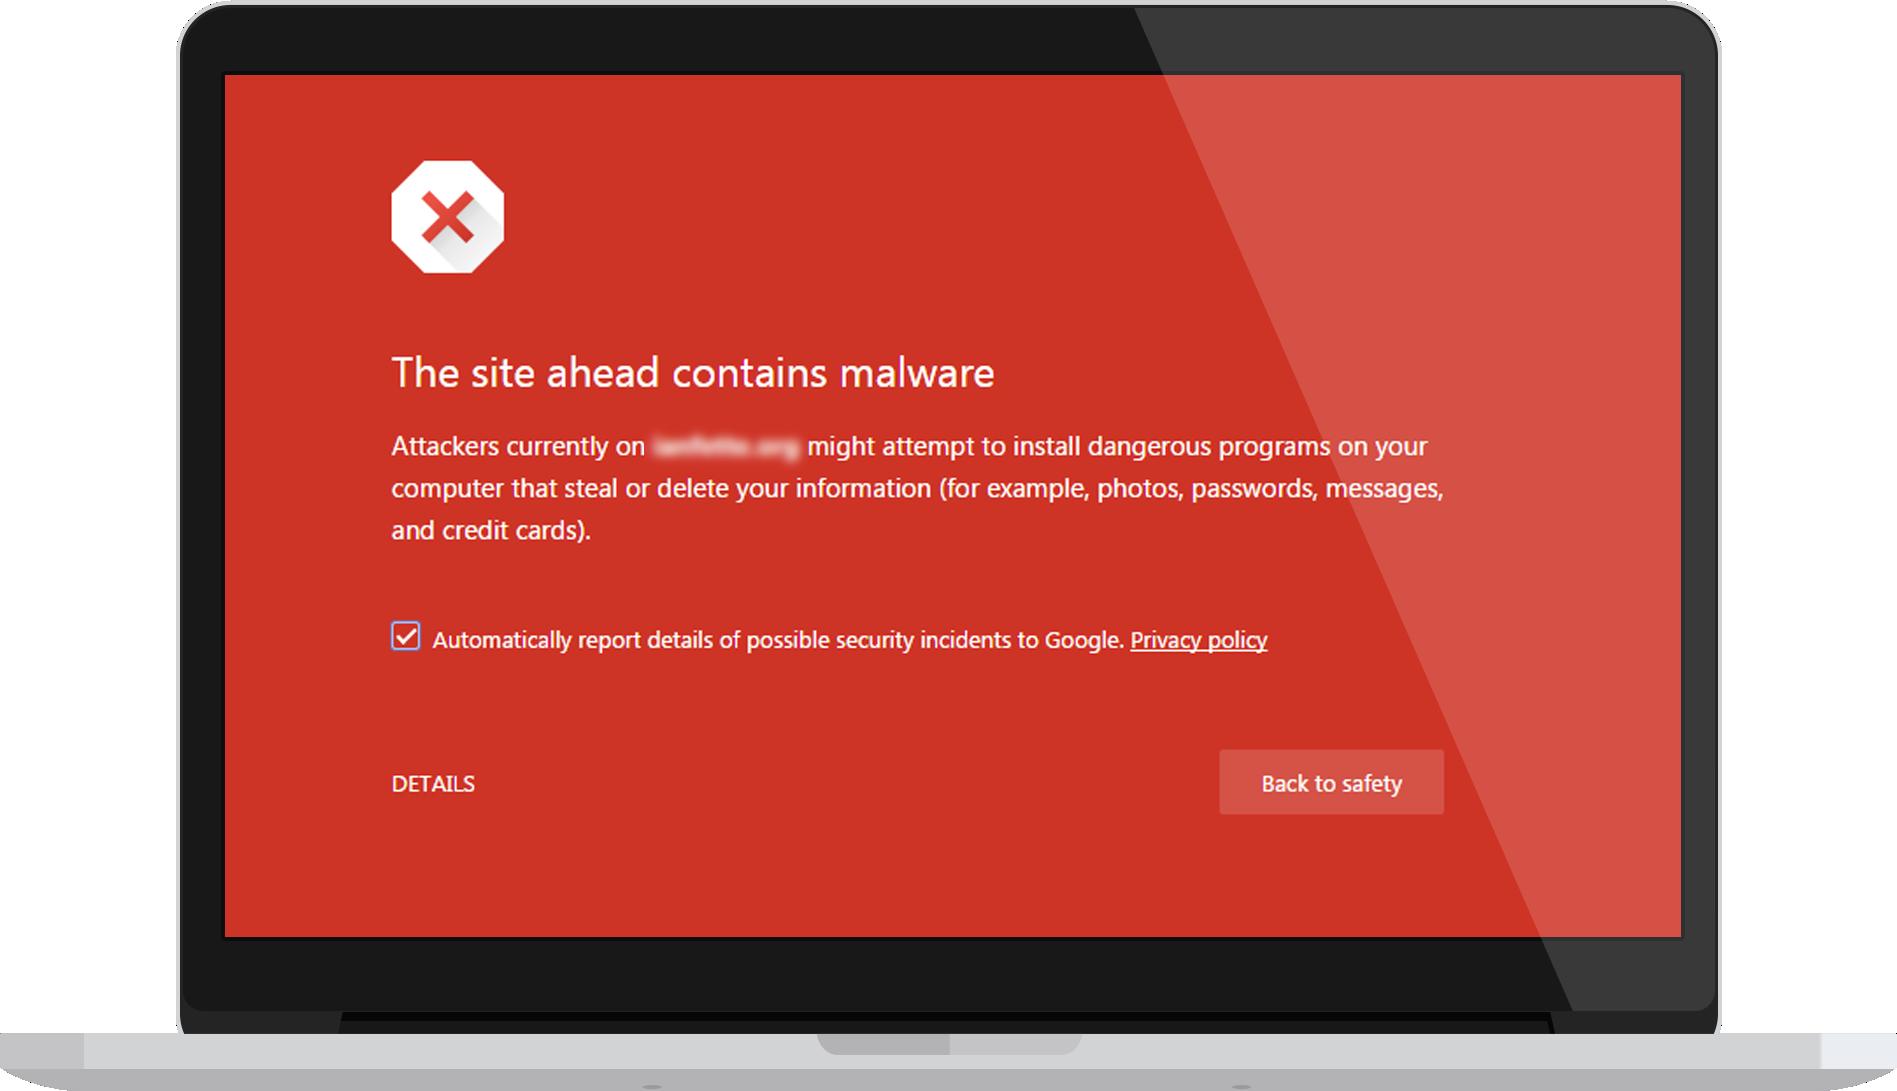 clean malware website blog